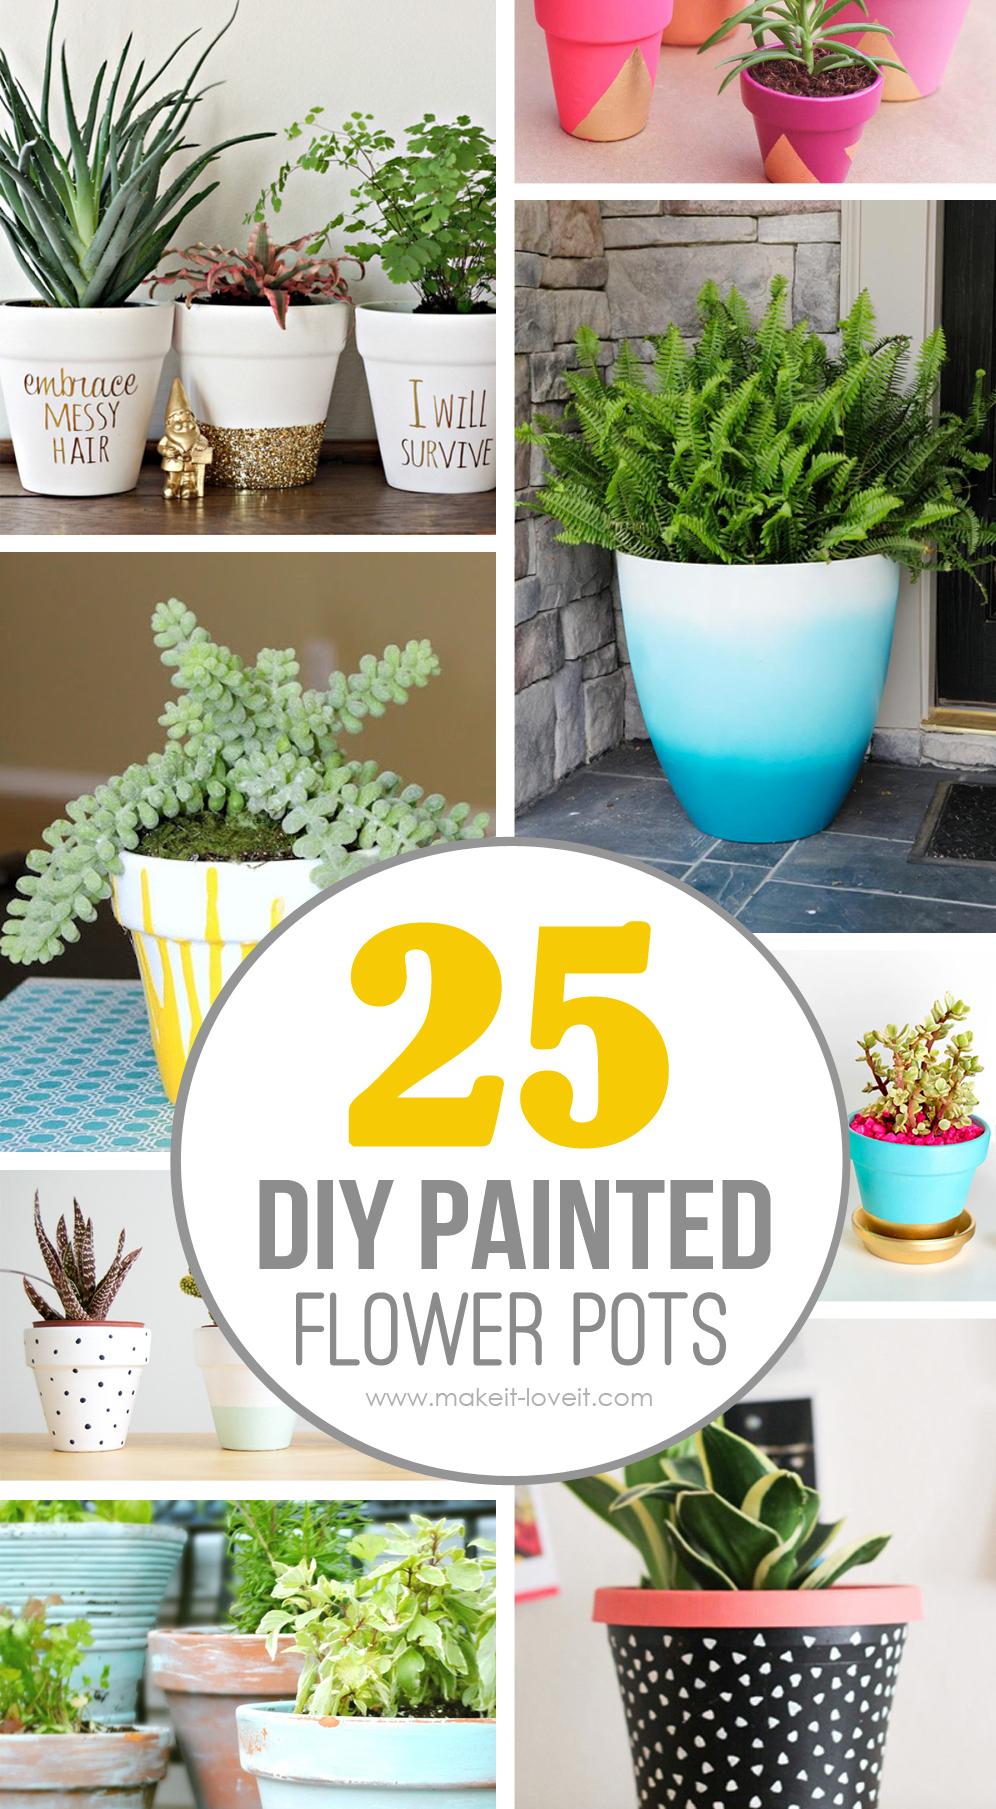 25-DIY-Painted-Flower-Pot-Ideas